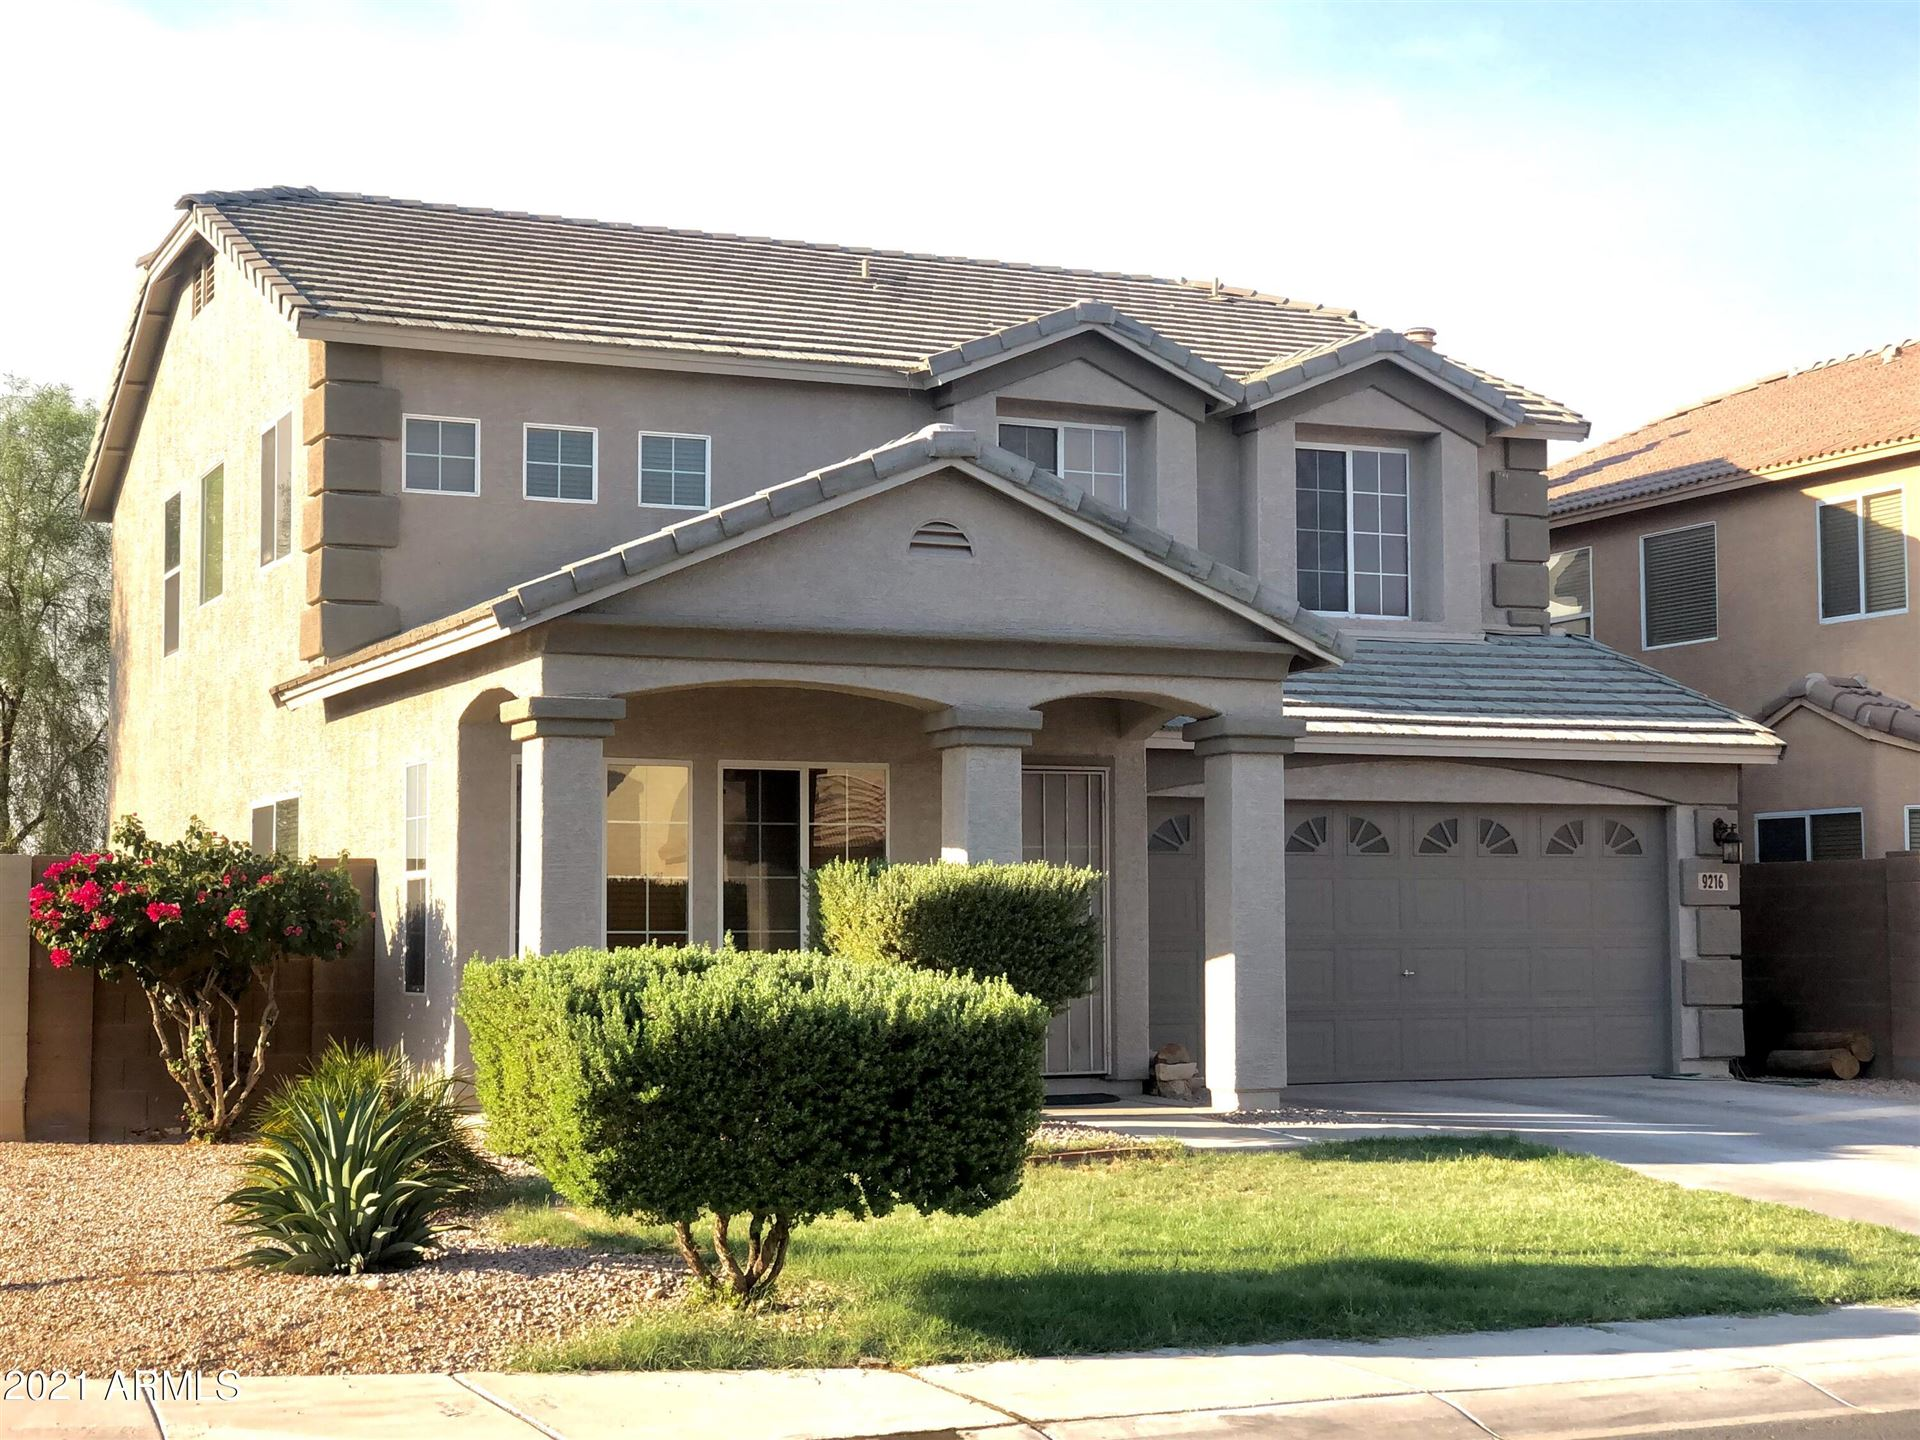 Photo of 9216 W PAYSON Road, Tolleson, AZ 85353 (MLS # 6266913)